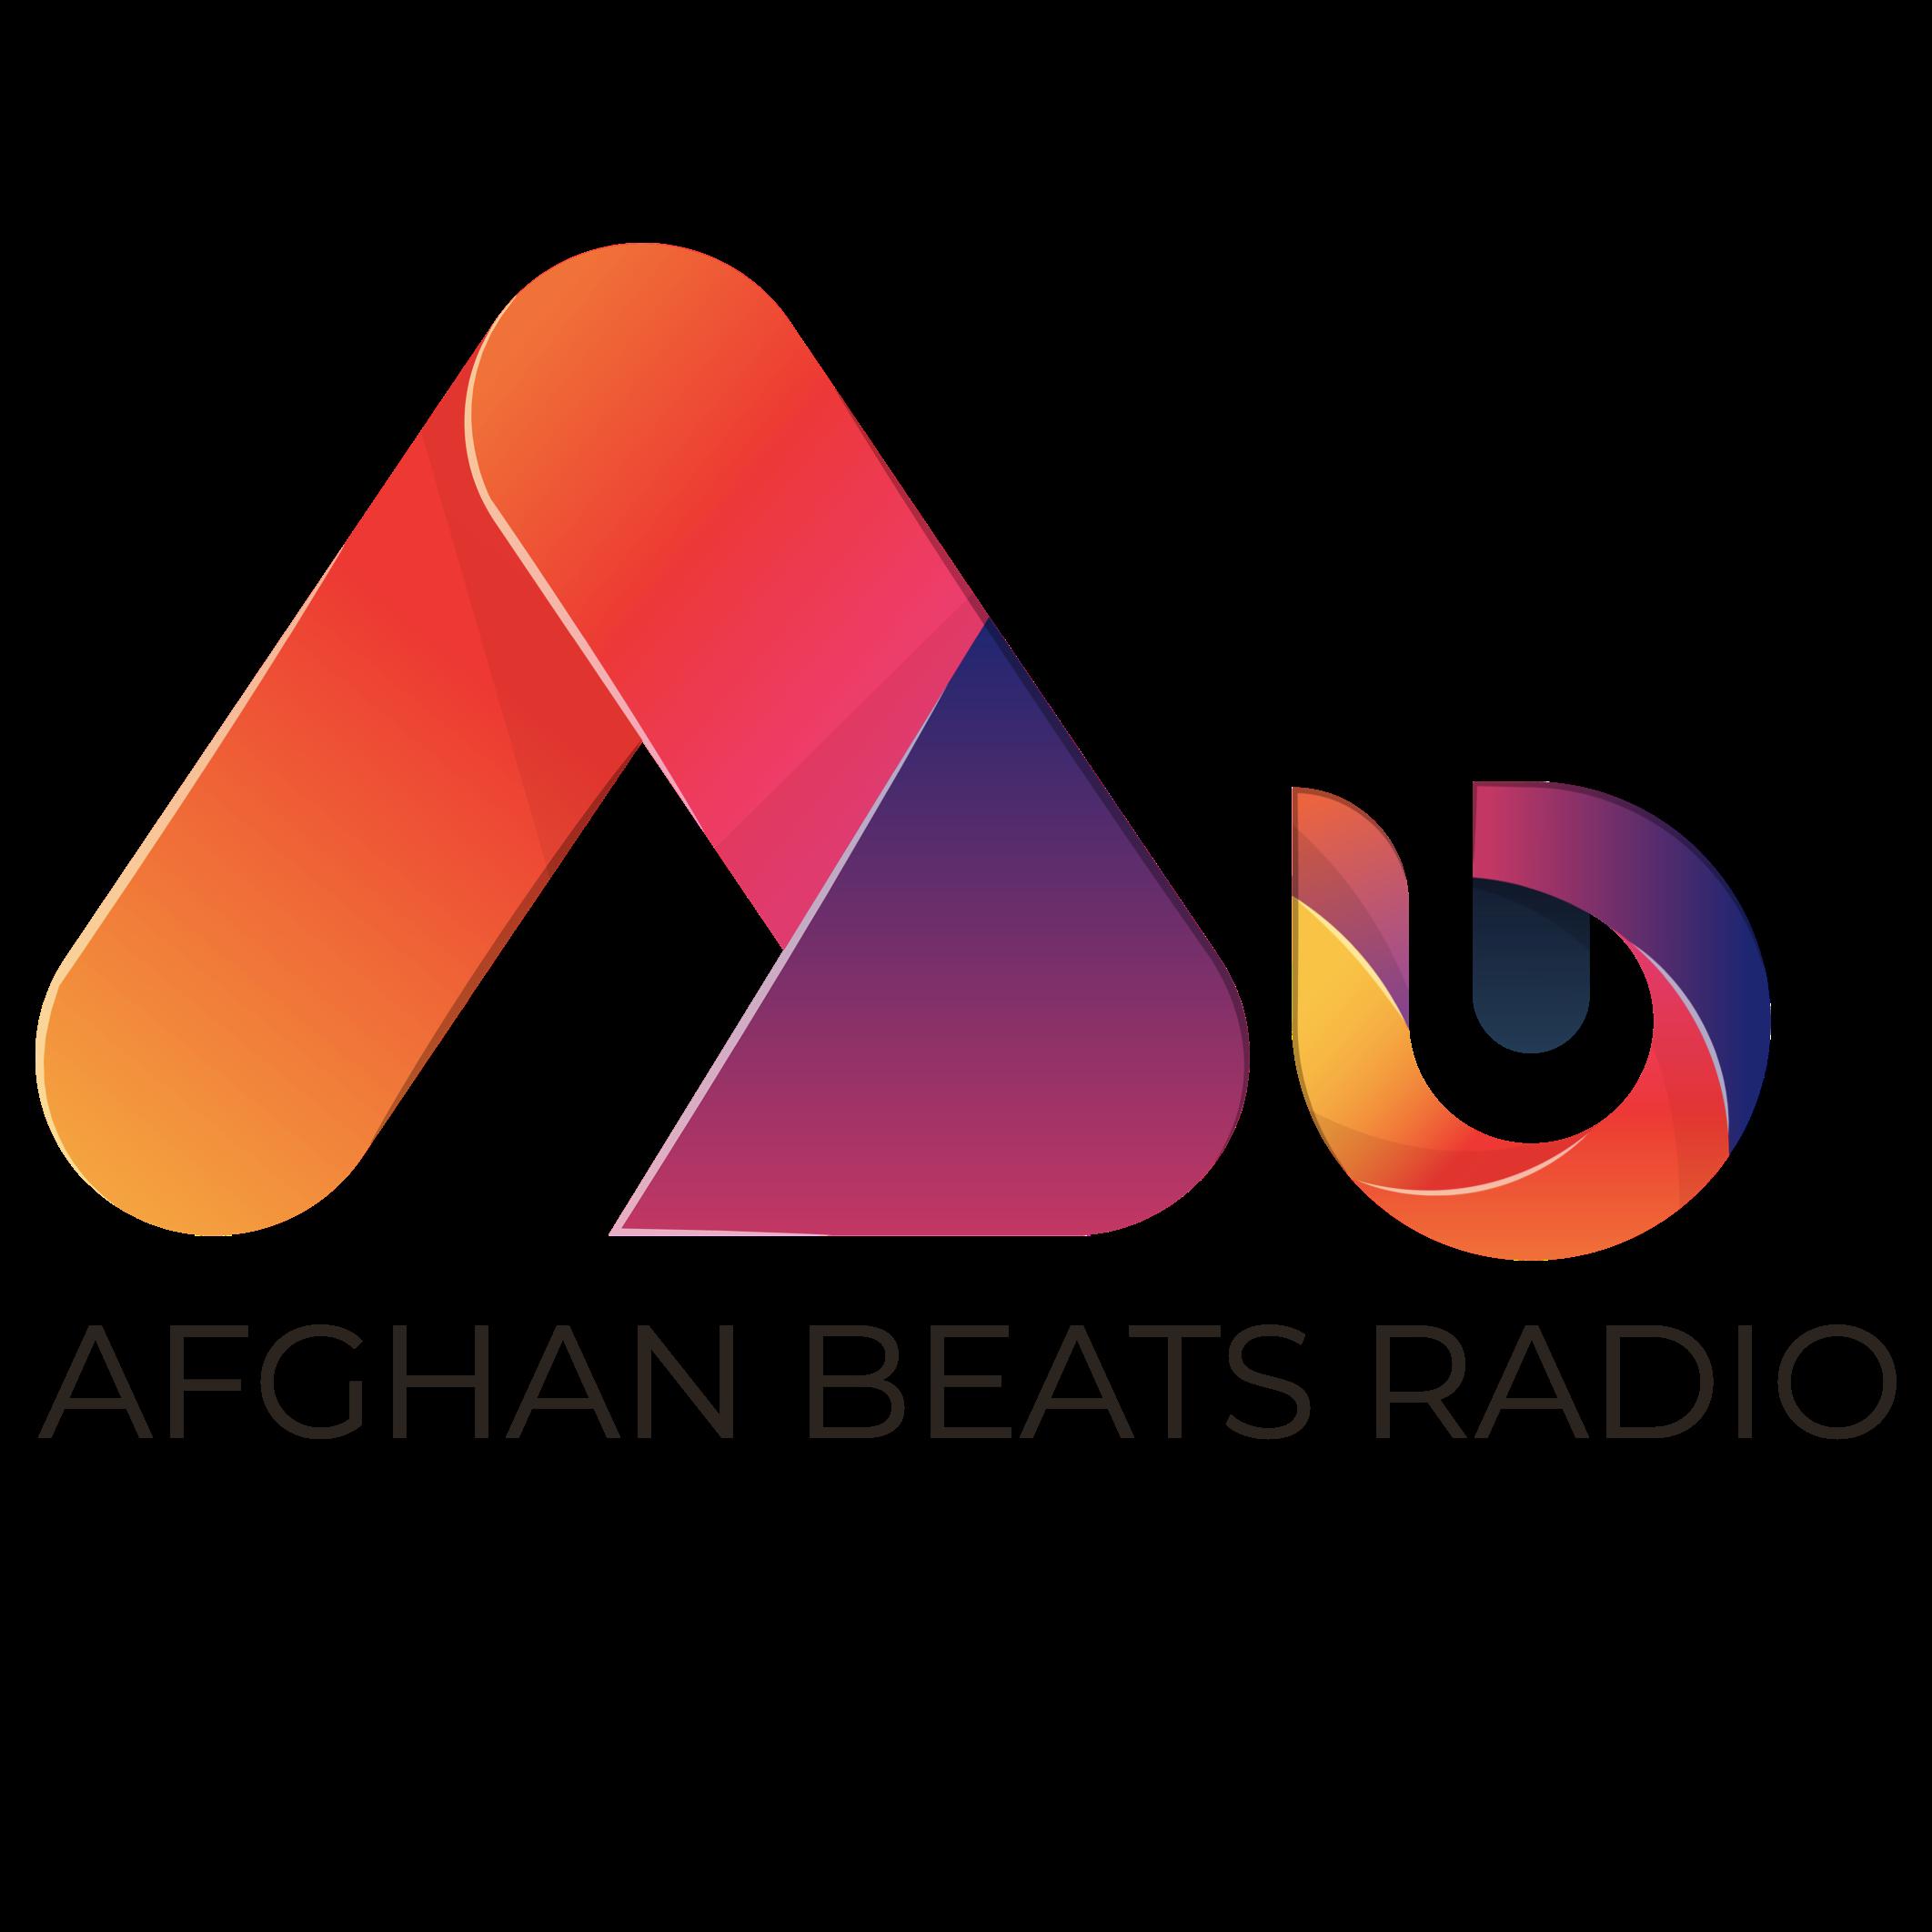 Afghan Beats